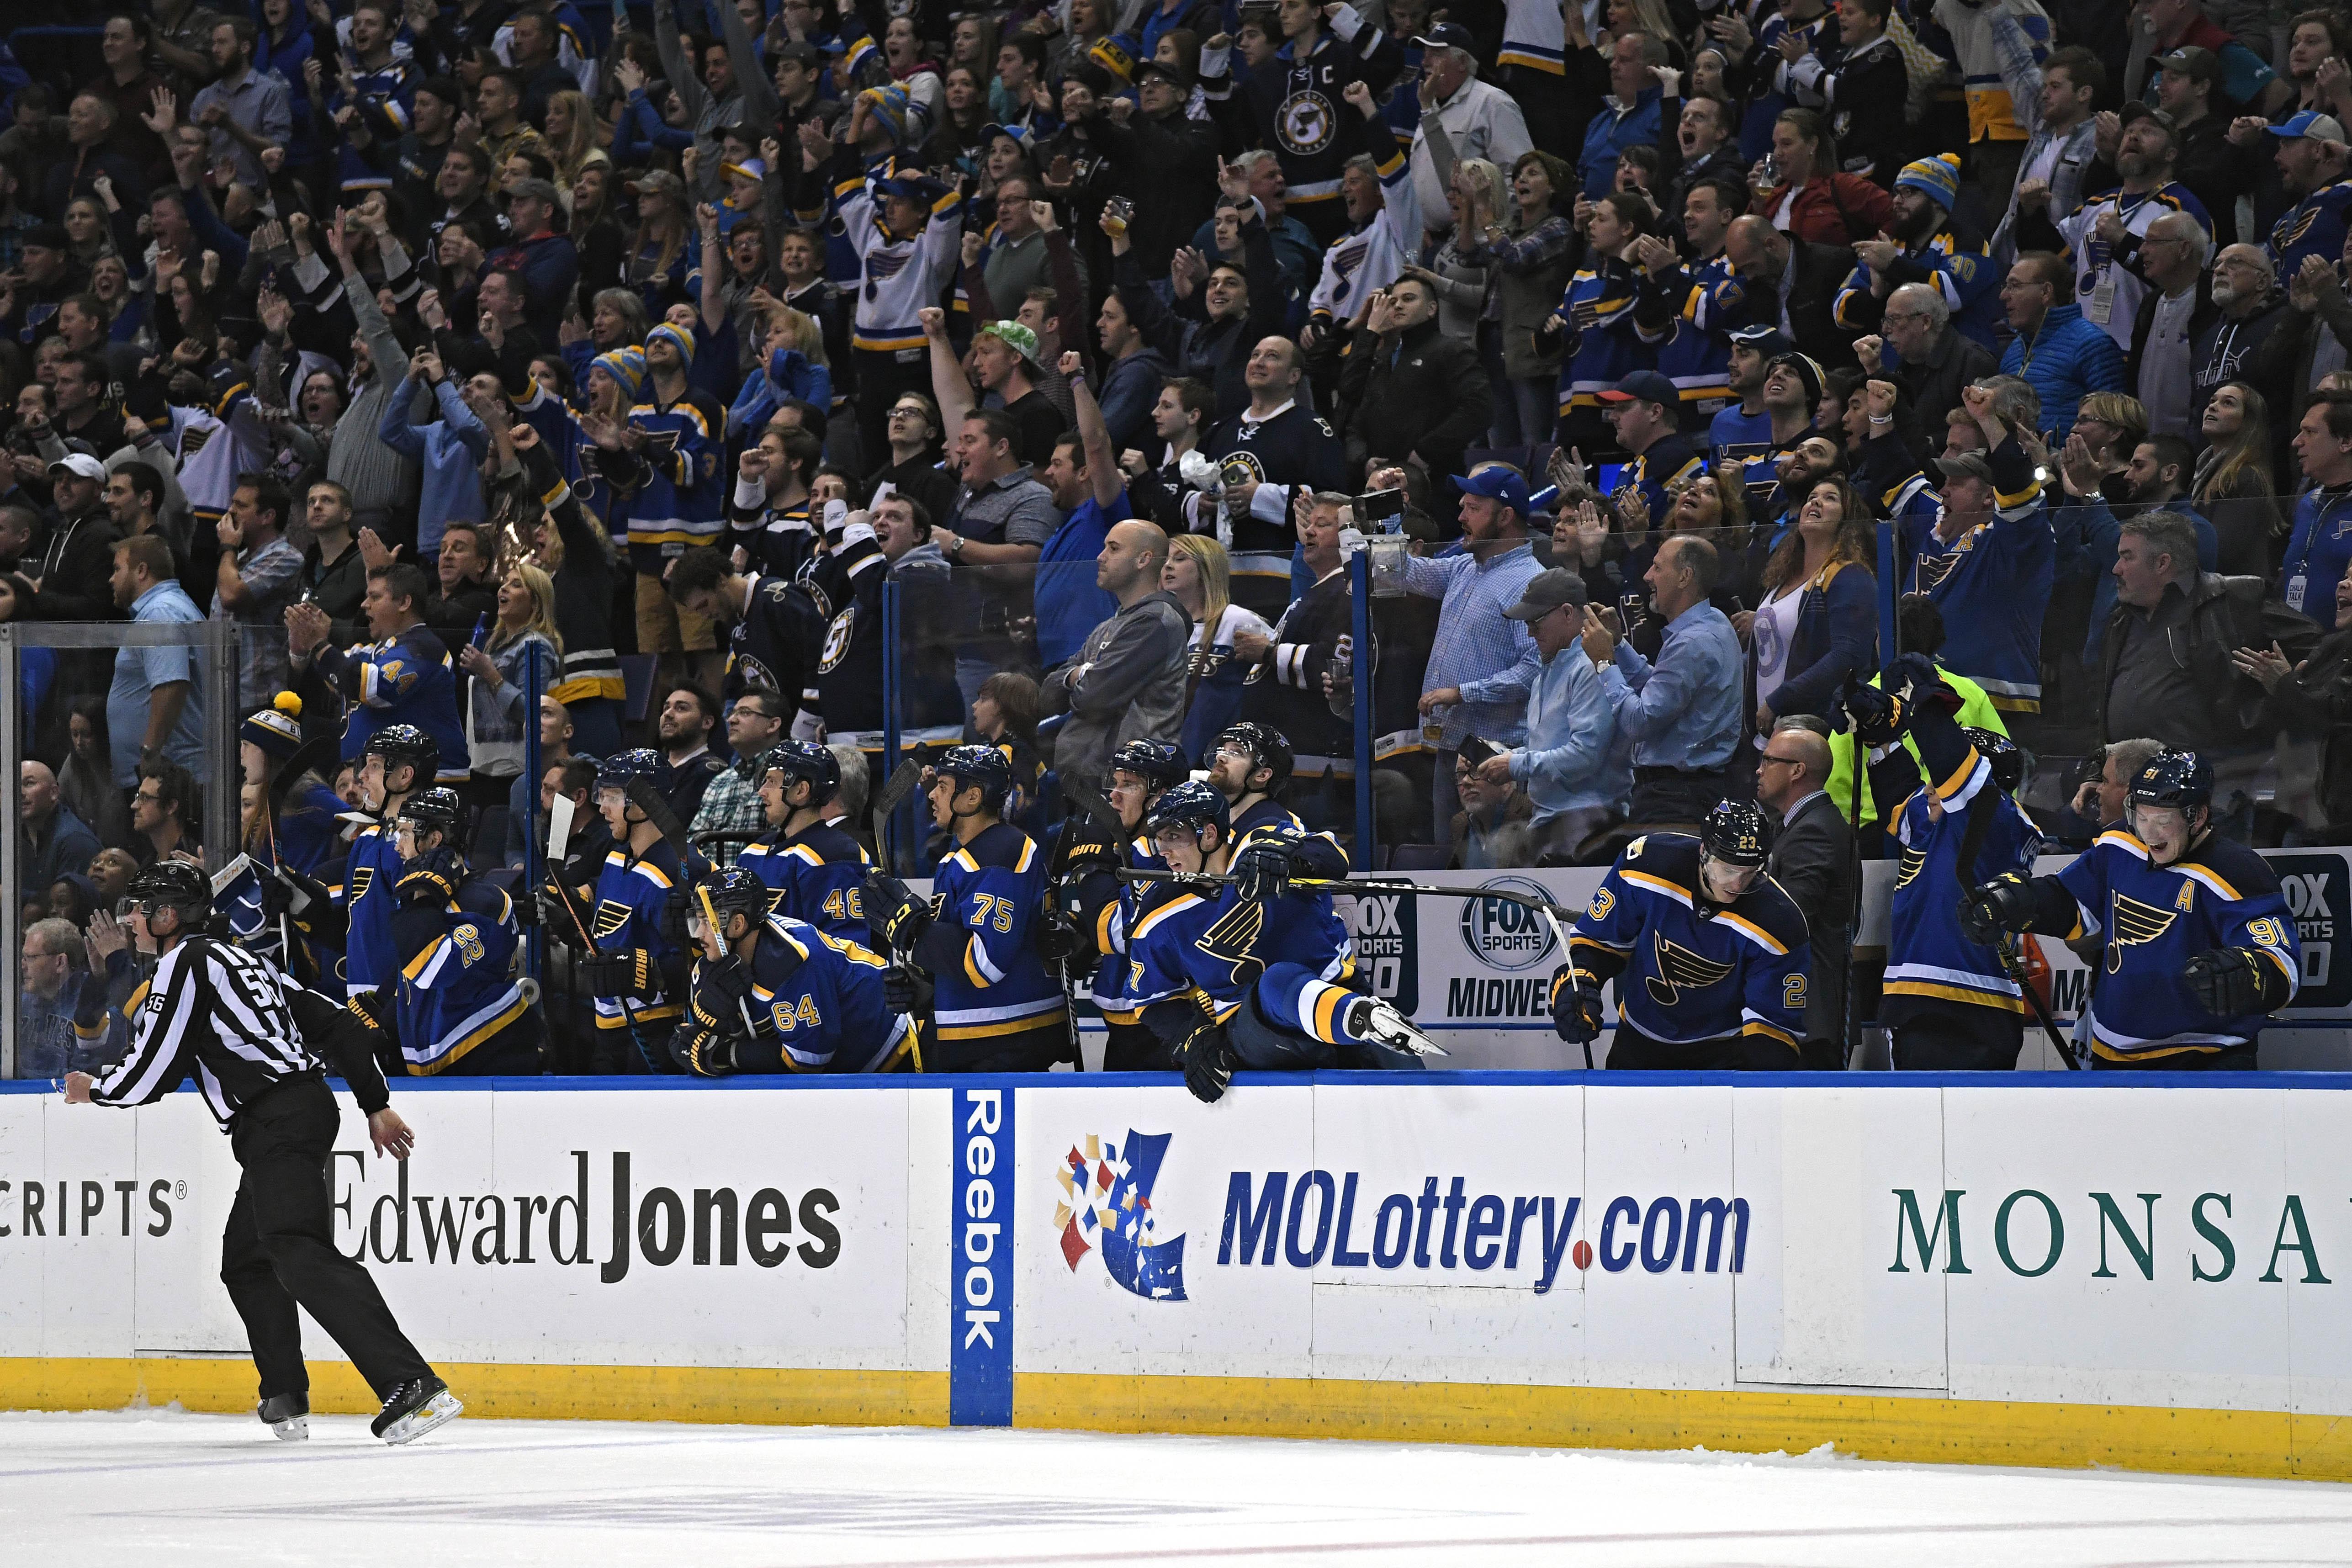 NHL: San Jose Sharks at St. Louis Blues